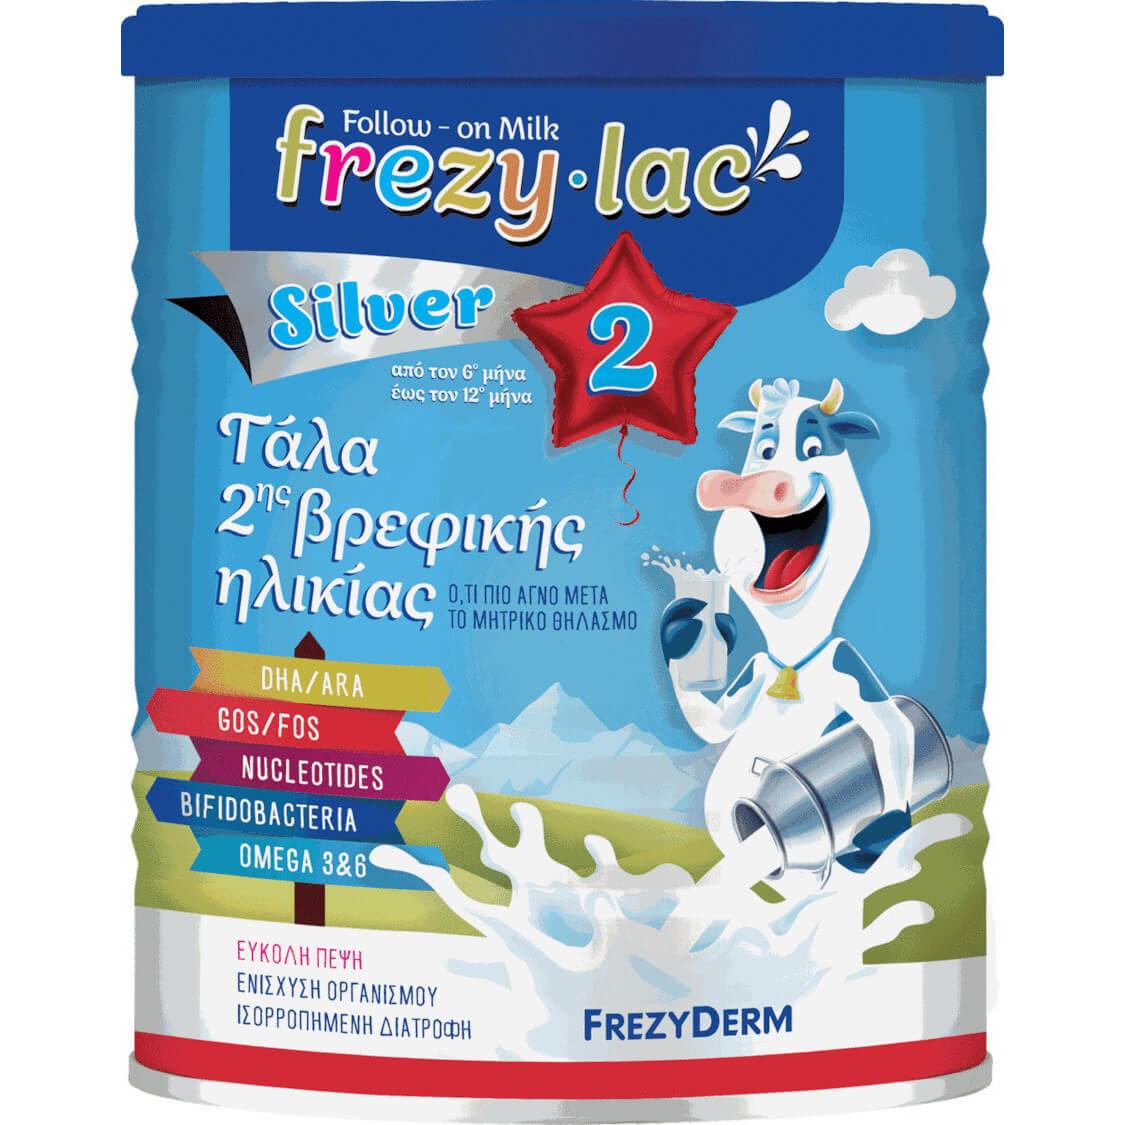 Frezyderm Frezylac Silver 2 Αγελαδινό Γάλα 2ης Βρεφικής Ηλικίας από τον 6ο Έως τον 12ο Μήνα 400gr